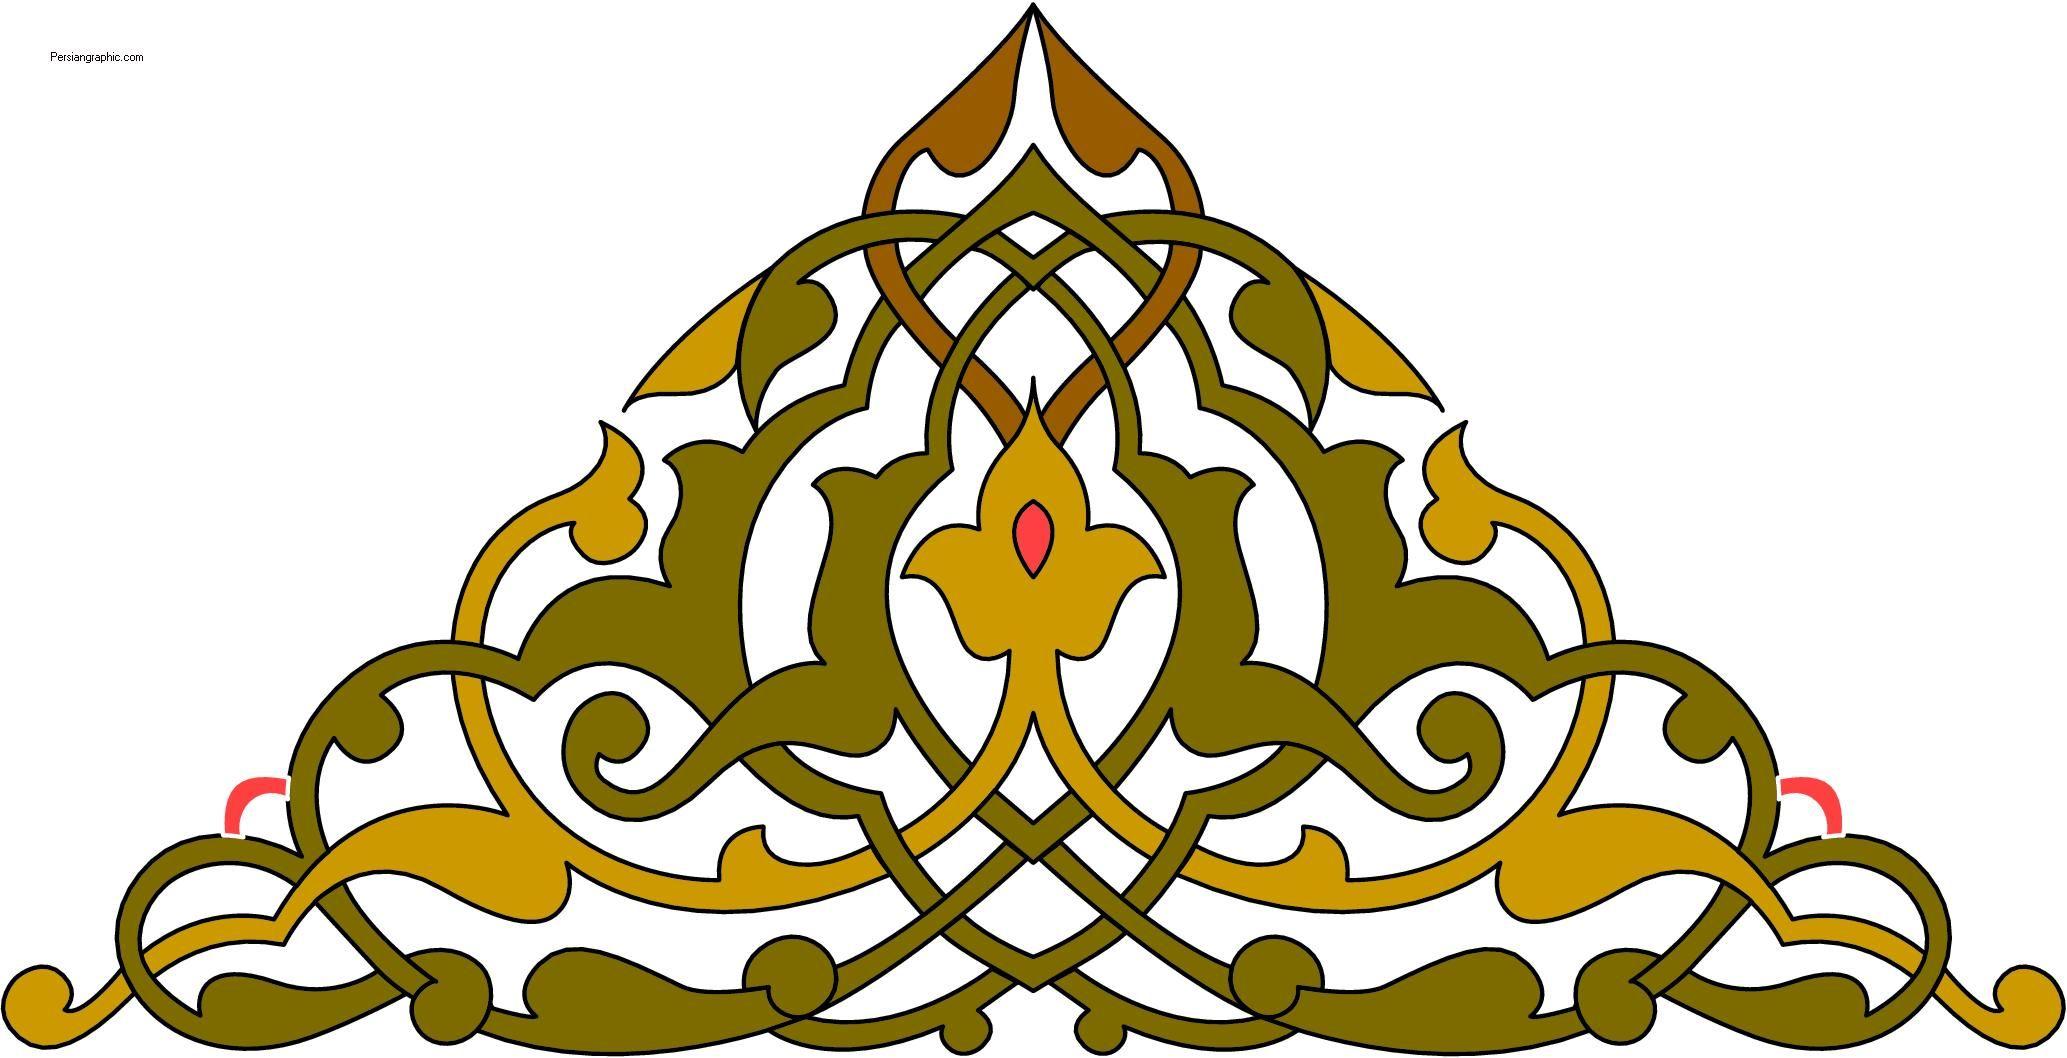 Graphic.ir Full Size Image Geometric design art, Islamic